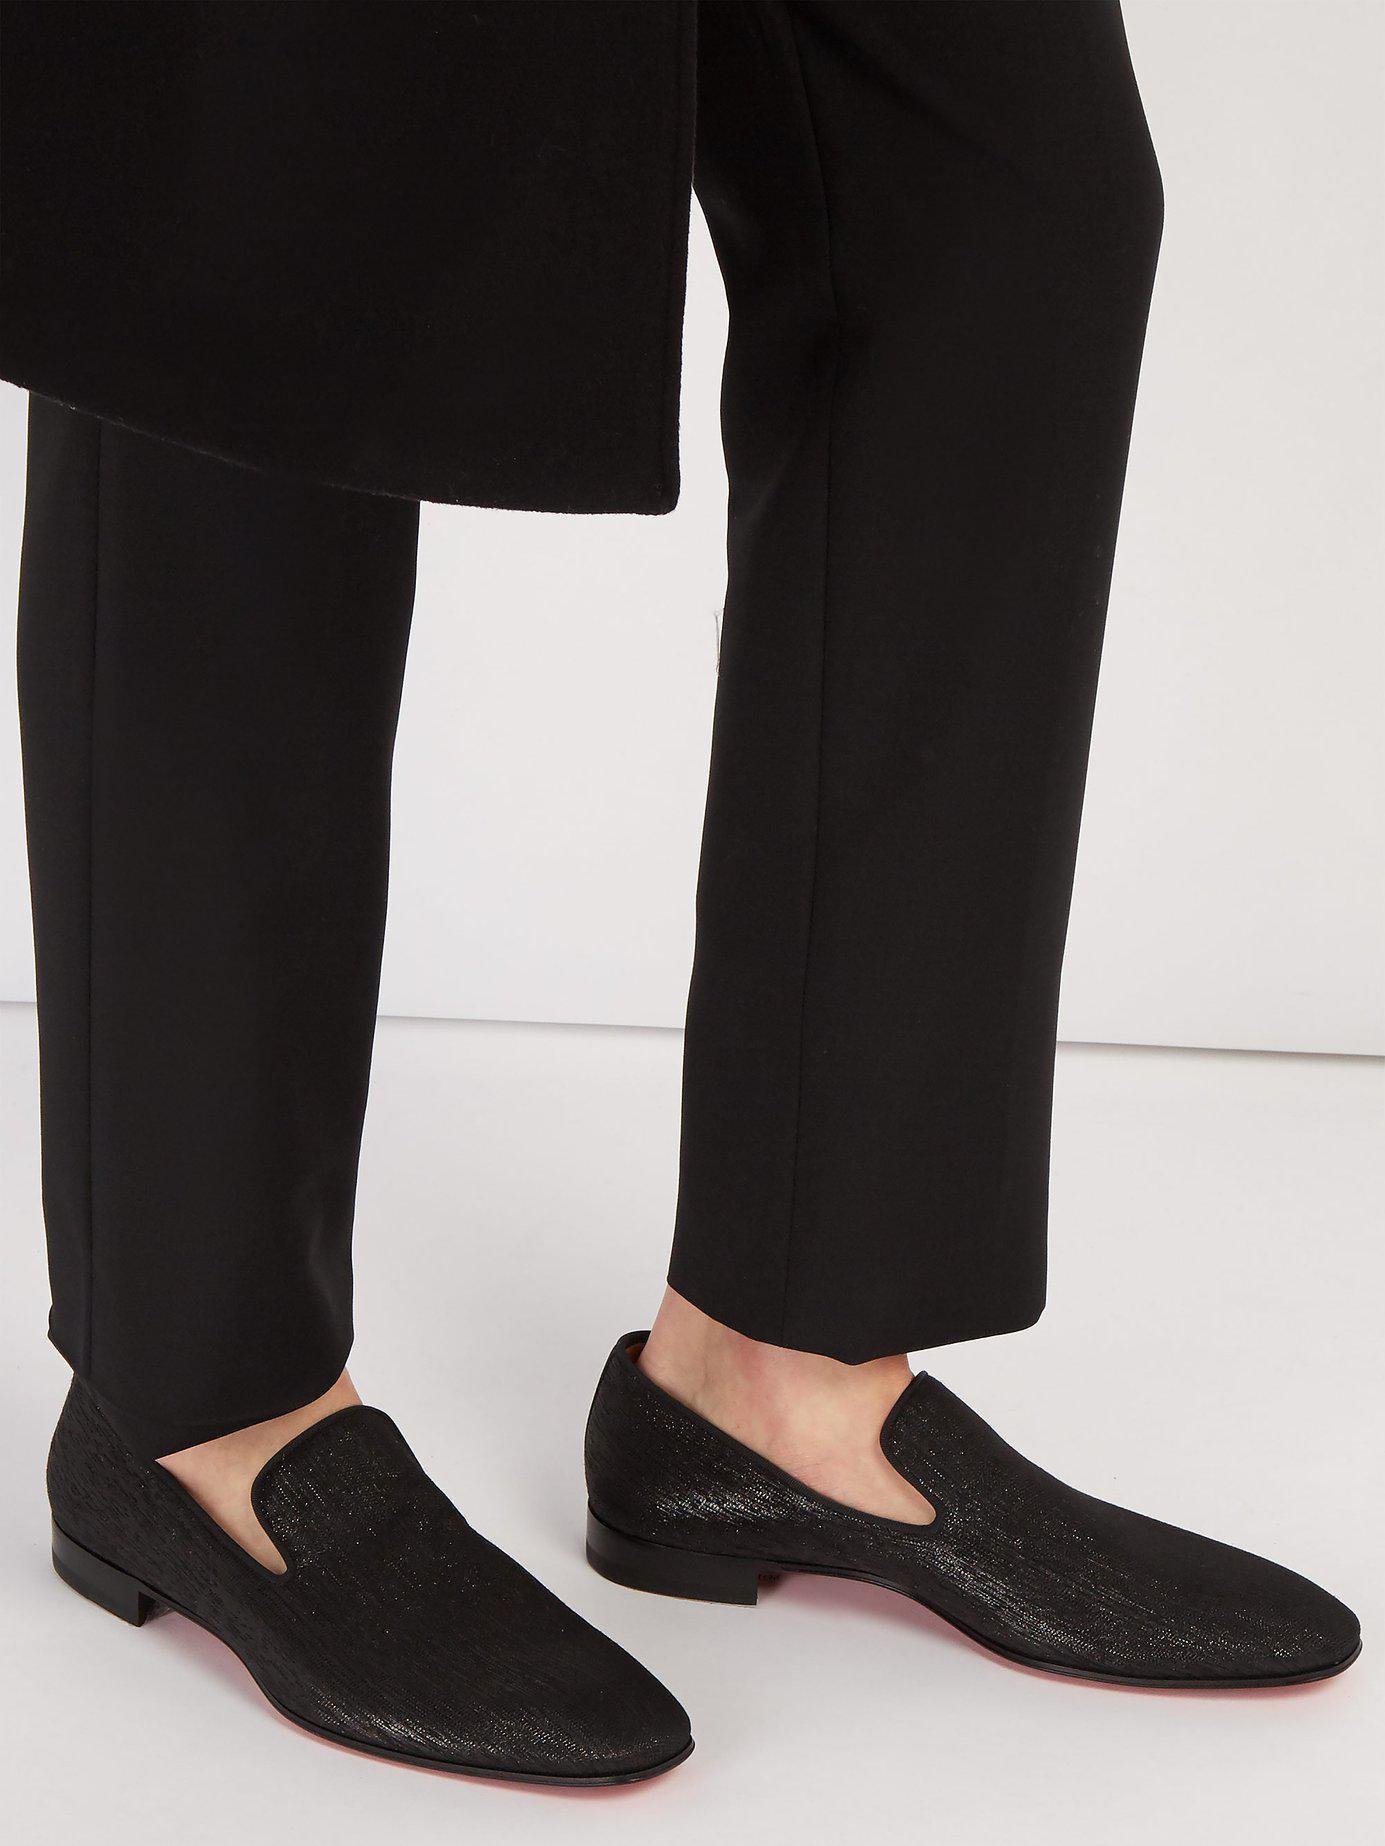 028693e76da Lyst - Christian Louboutin Dandelion Metallic Shantung Loafers in Black for  Men